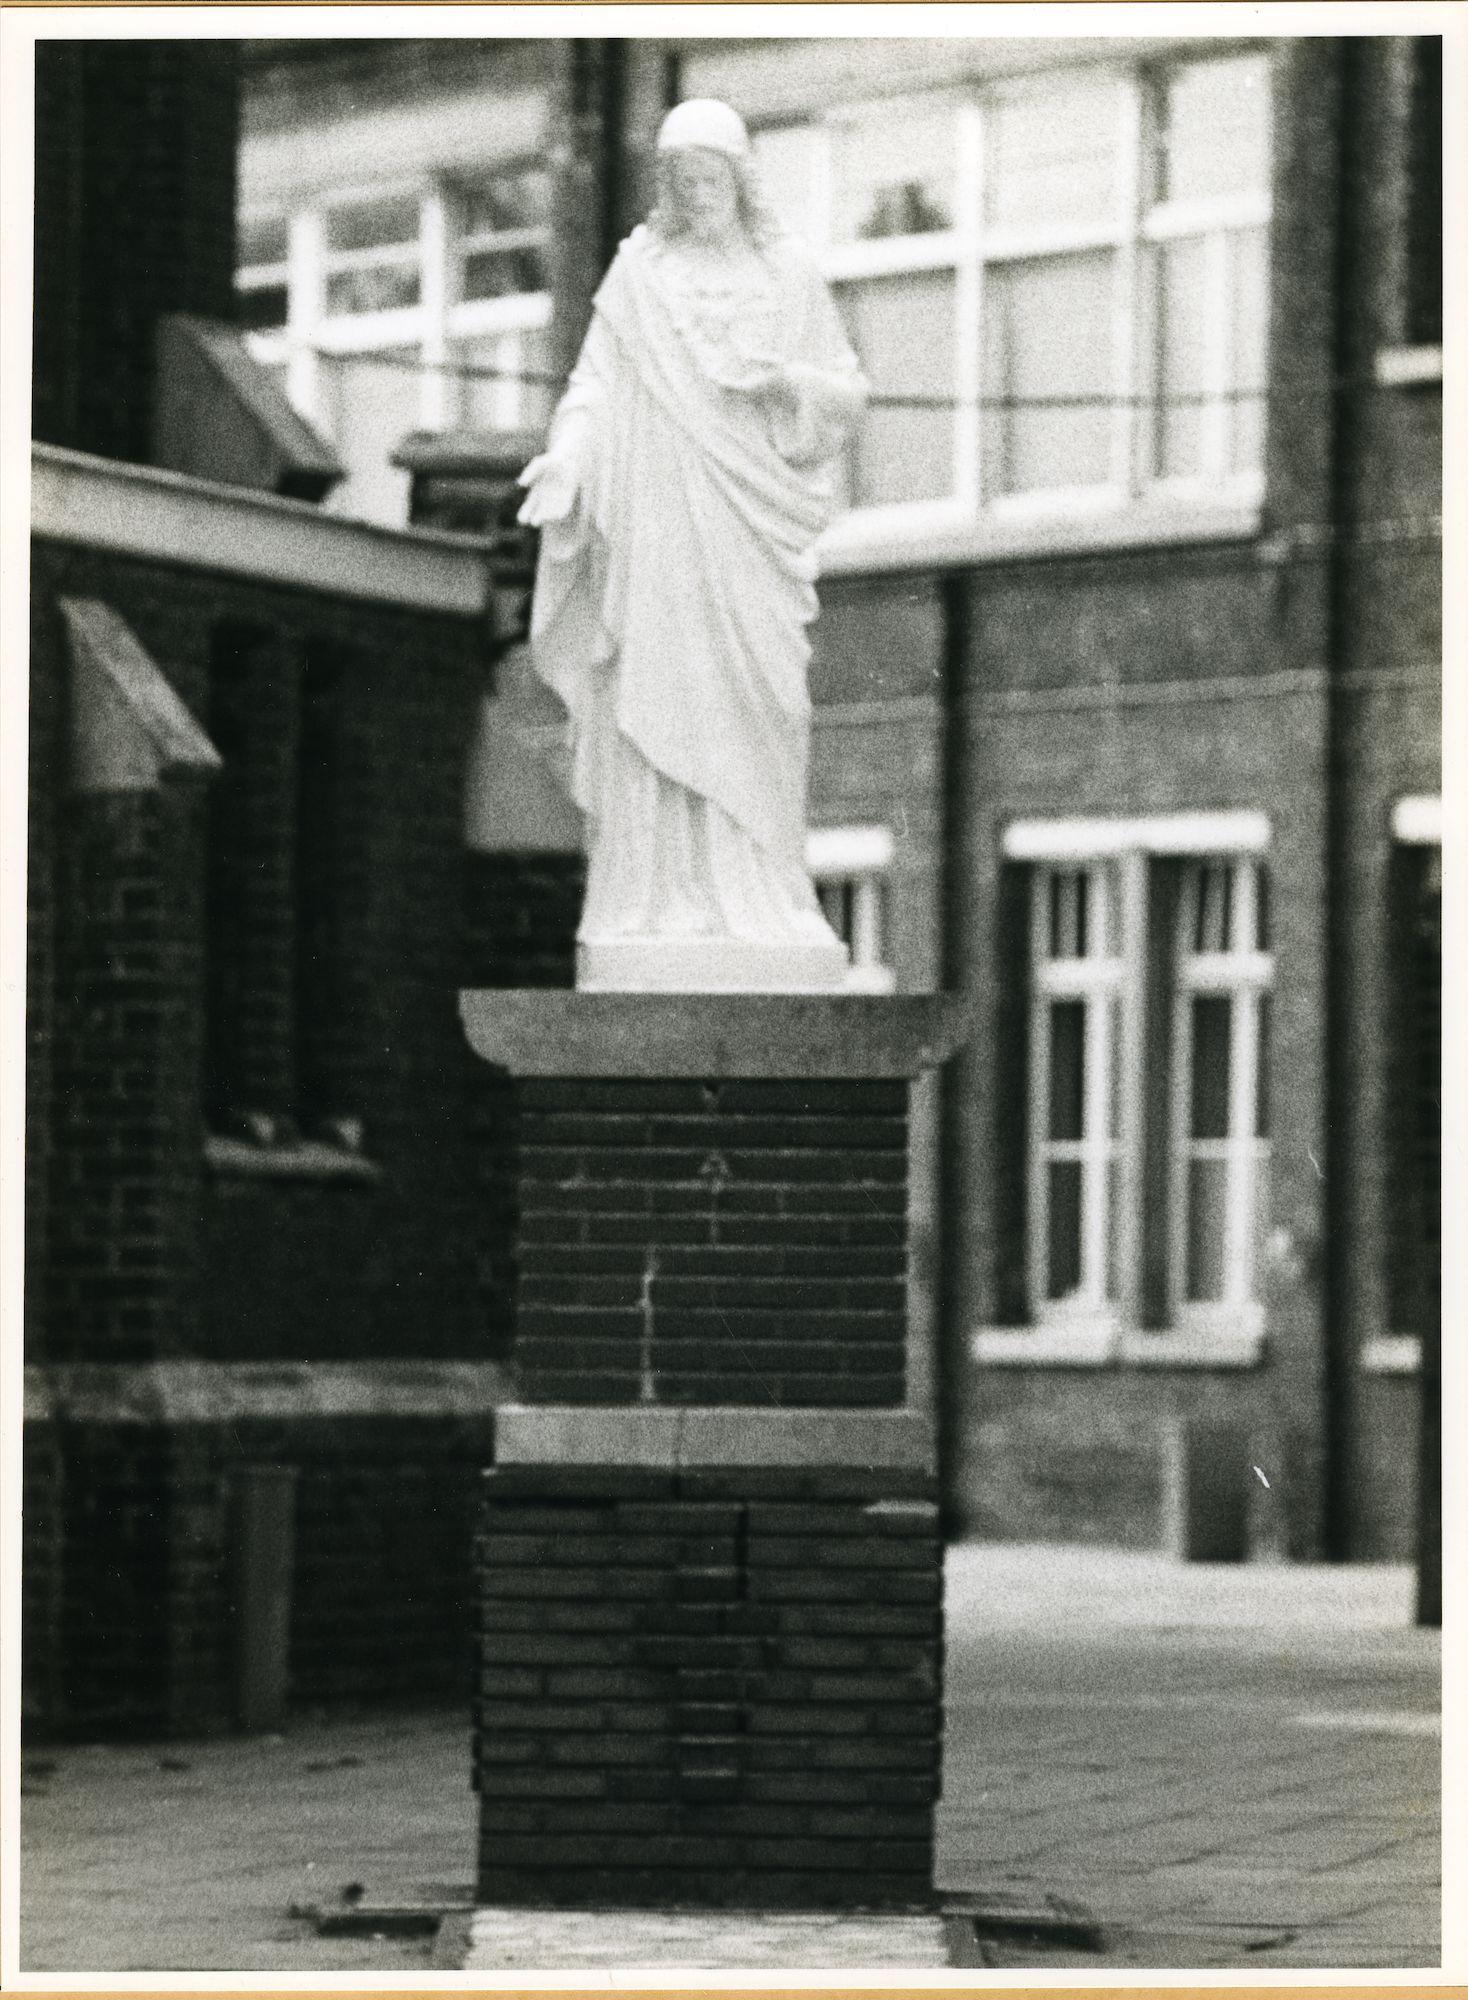 Sint-Denijs-Westrem: Kloosterstraat: Standbeeld, 1979